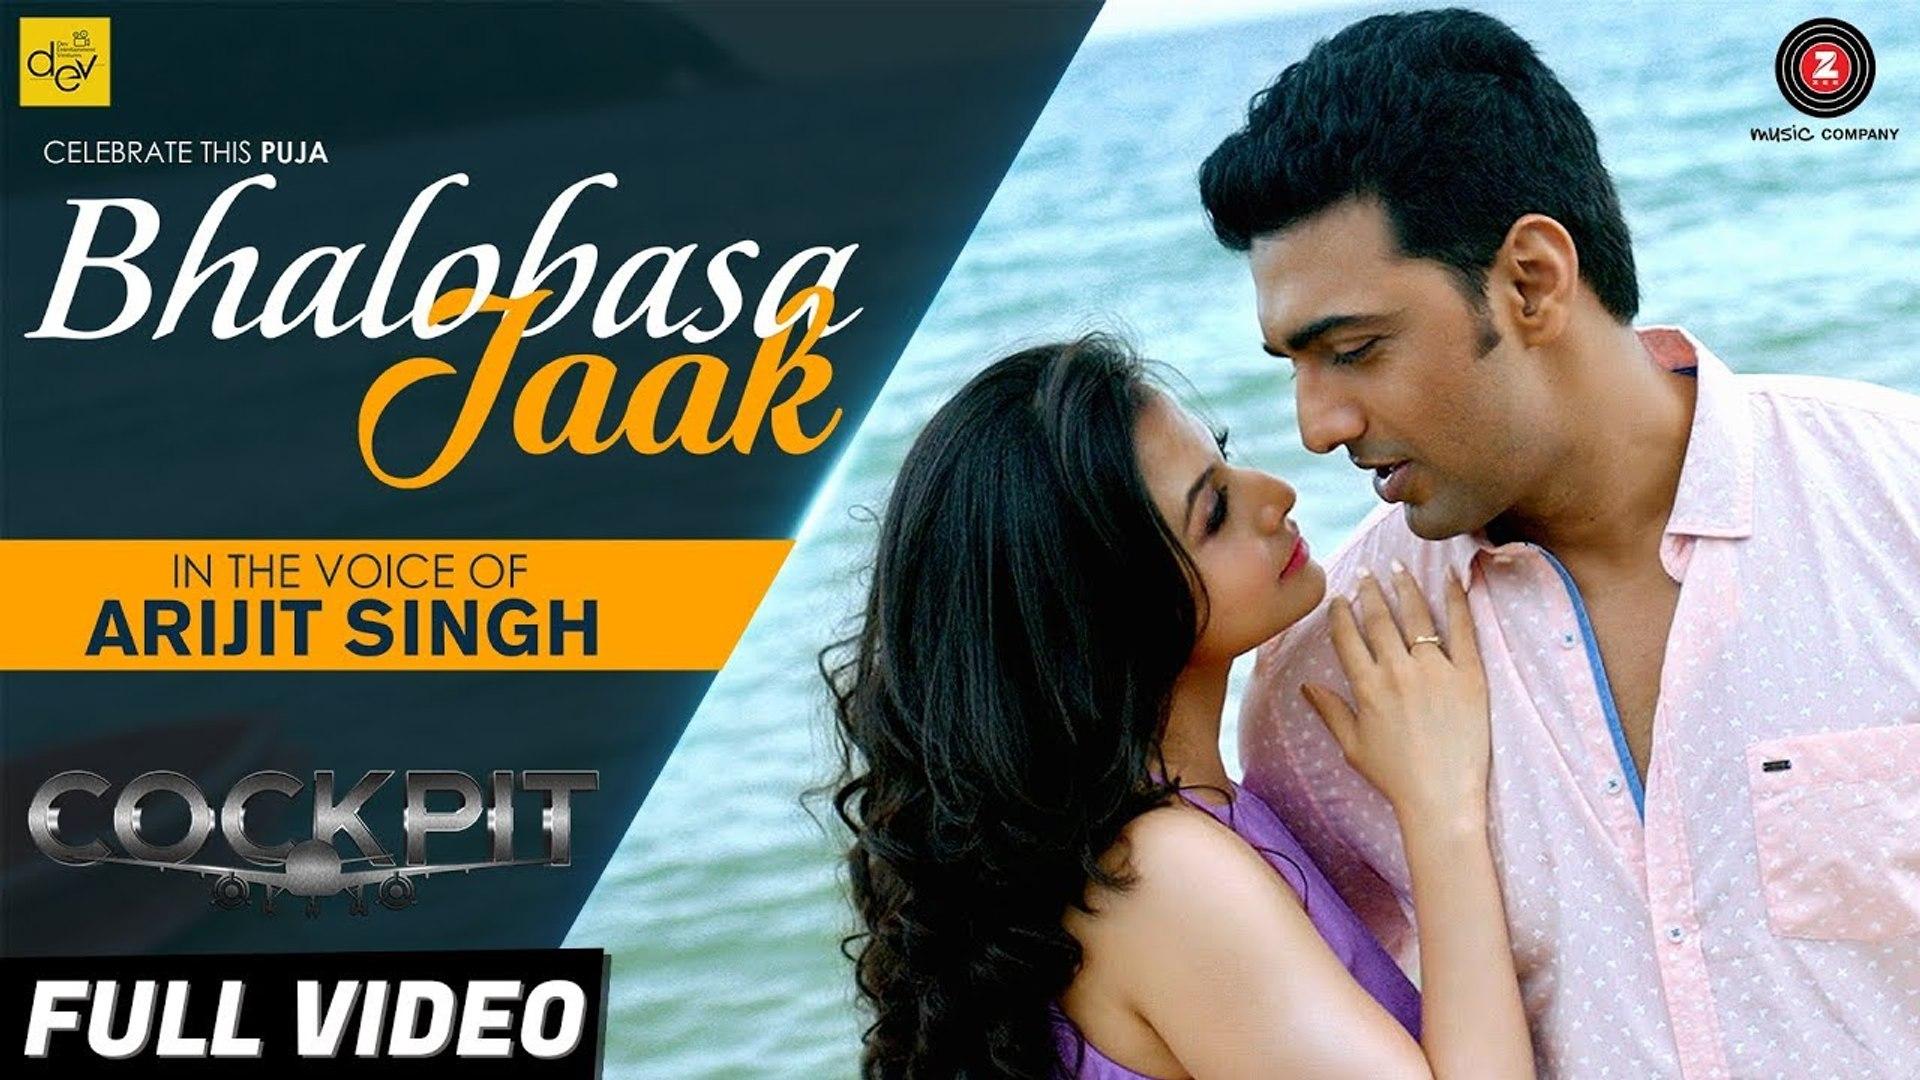 Bhalobasa Jaak Bengali Song HD Video Cockpit 2017 -Dev, Koel, Rukmini - Arijit Singh, Somlata - Arin